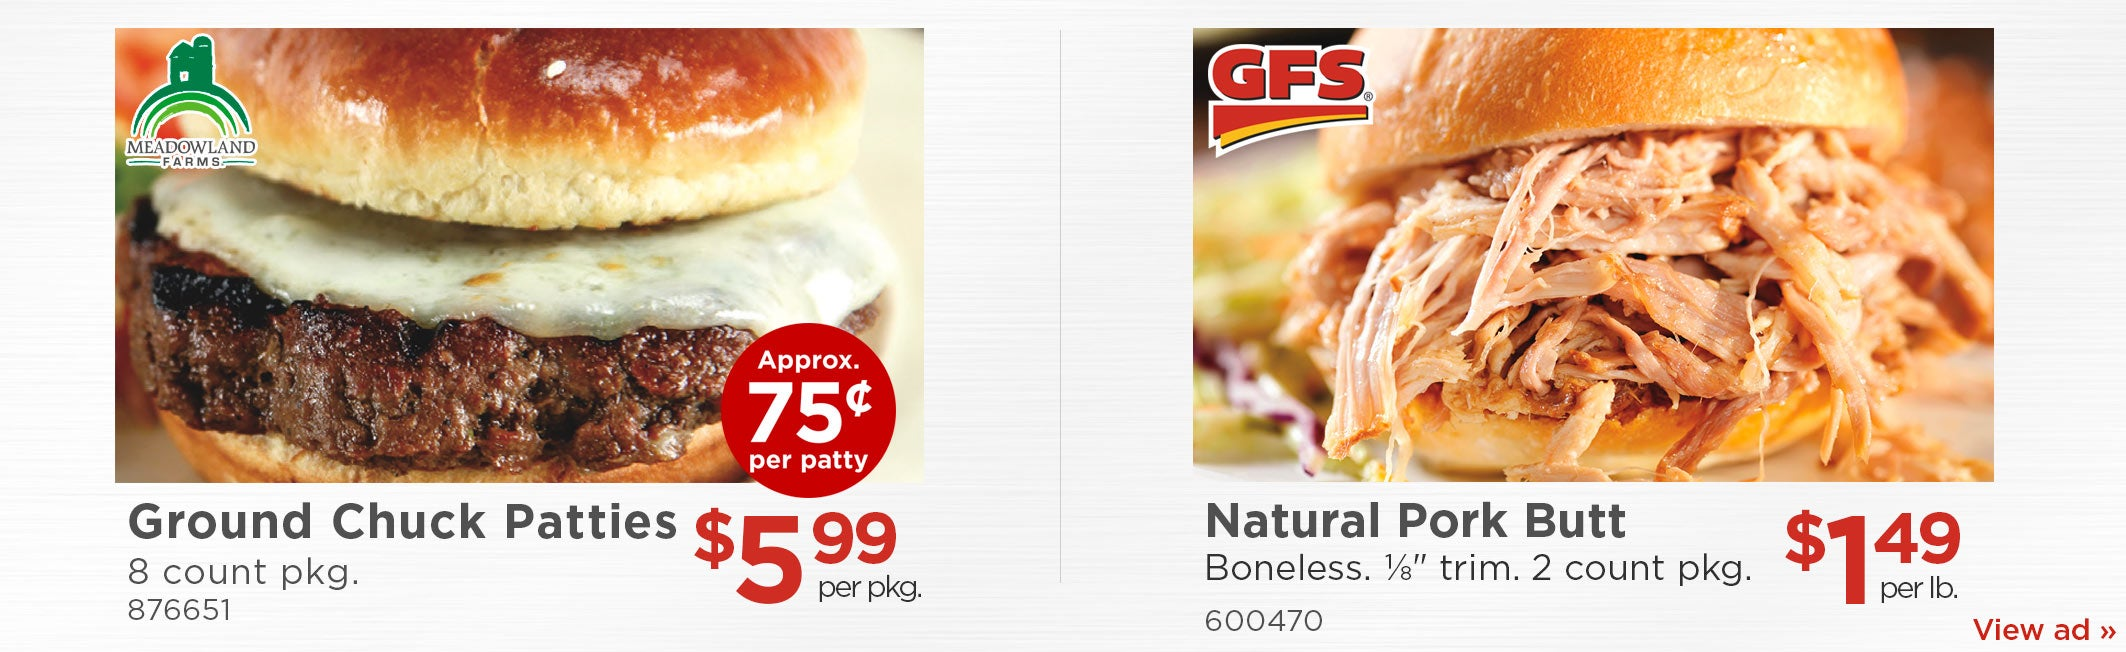 Ground Chuck Patties $5.99 per pkg. - Natural Pork Butt $1.99 per lb.